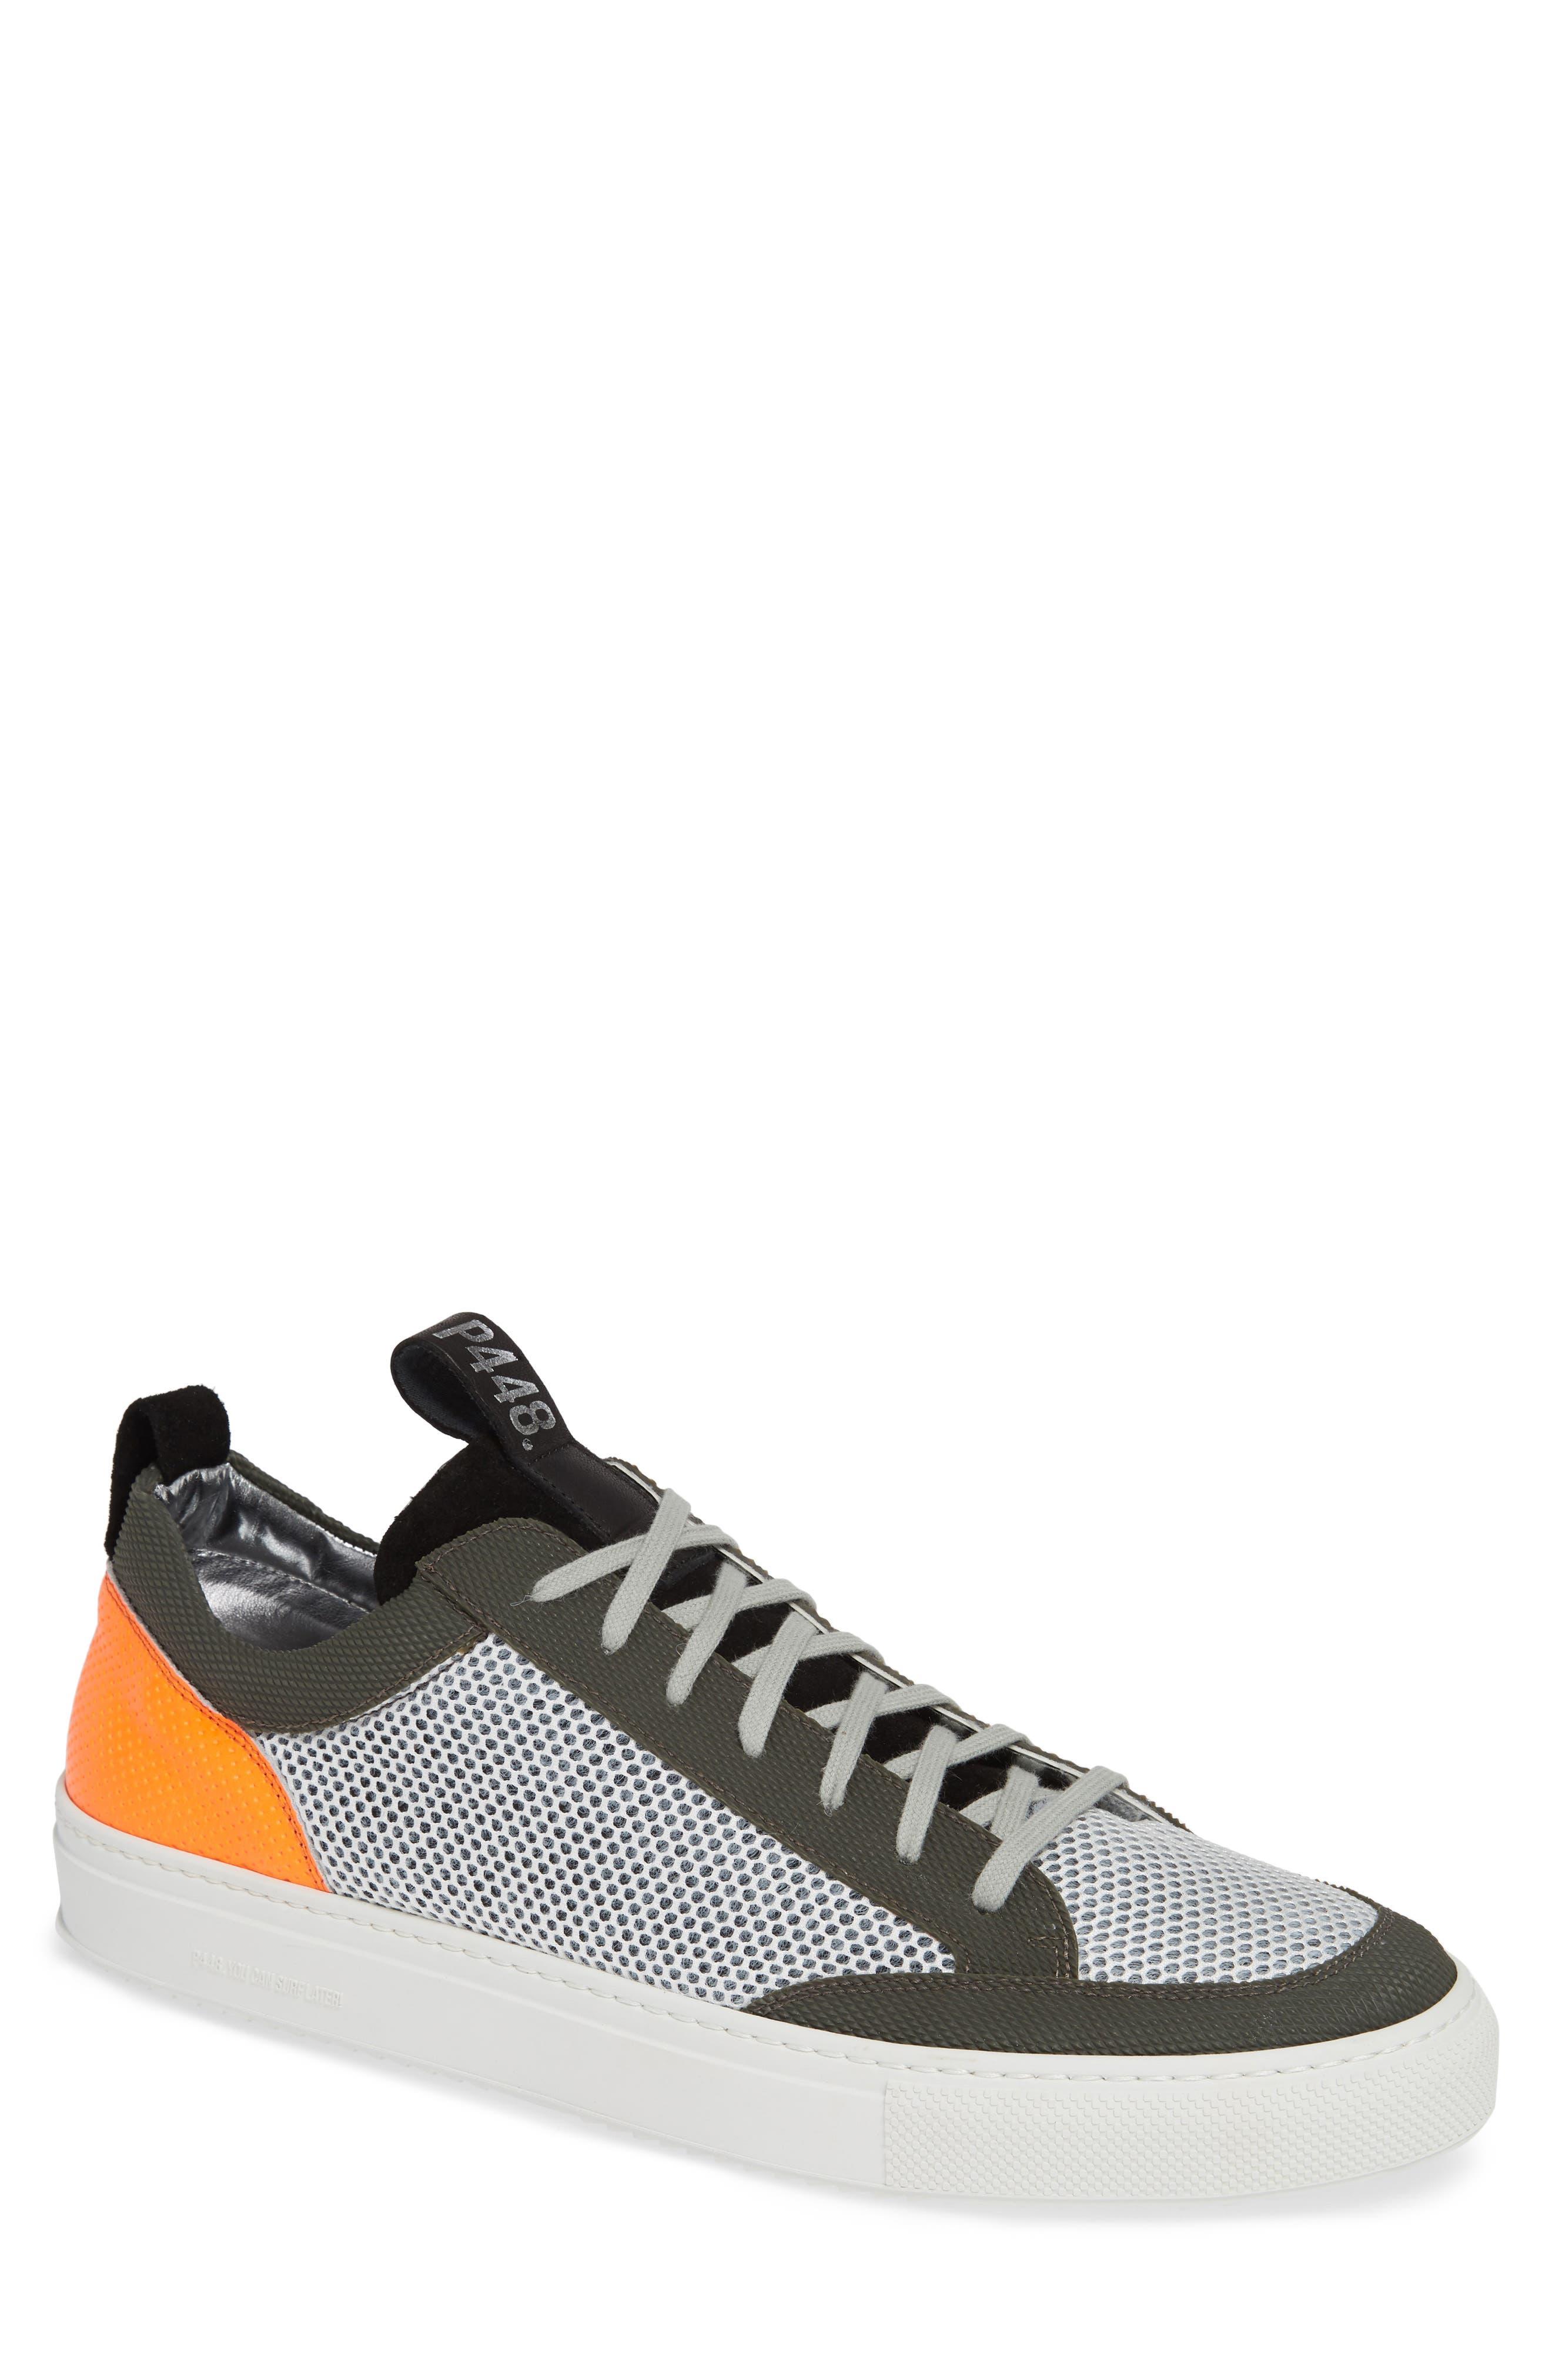 A8Soho Textured Sneaker,                             Main thumbnail 1, color,                             WHITE/ GREY